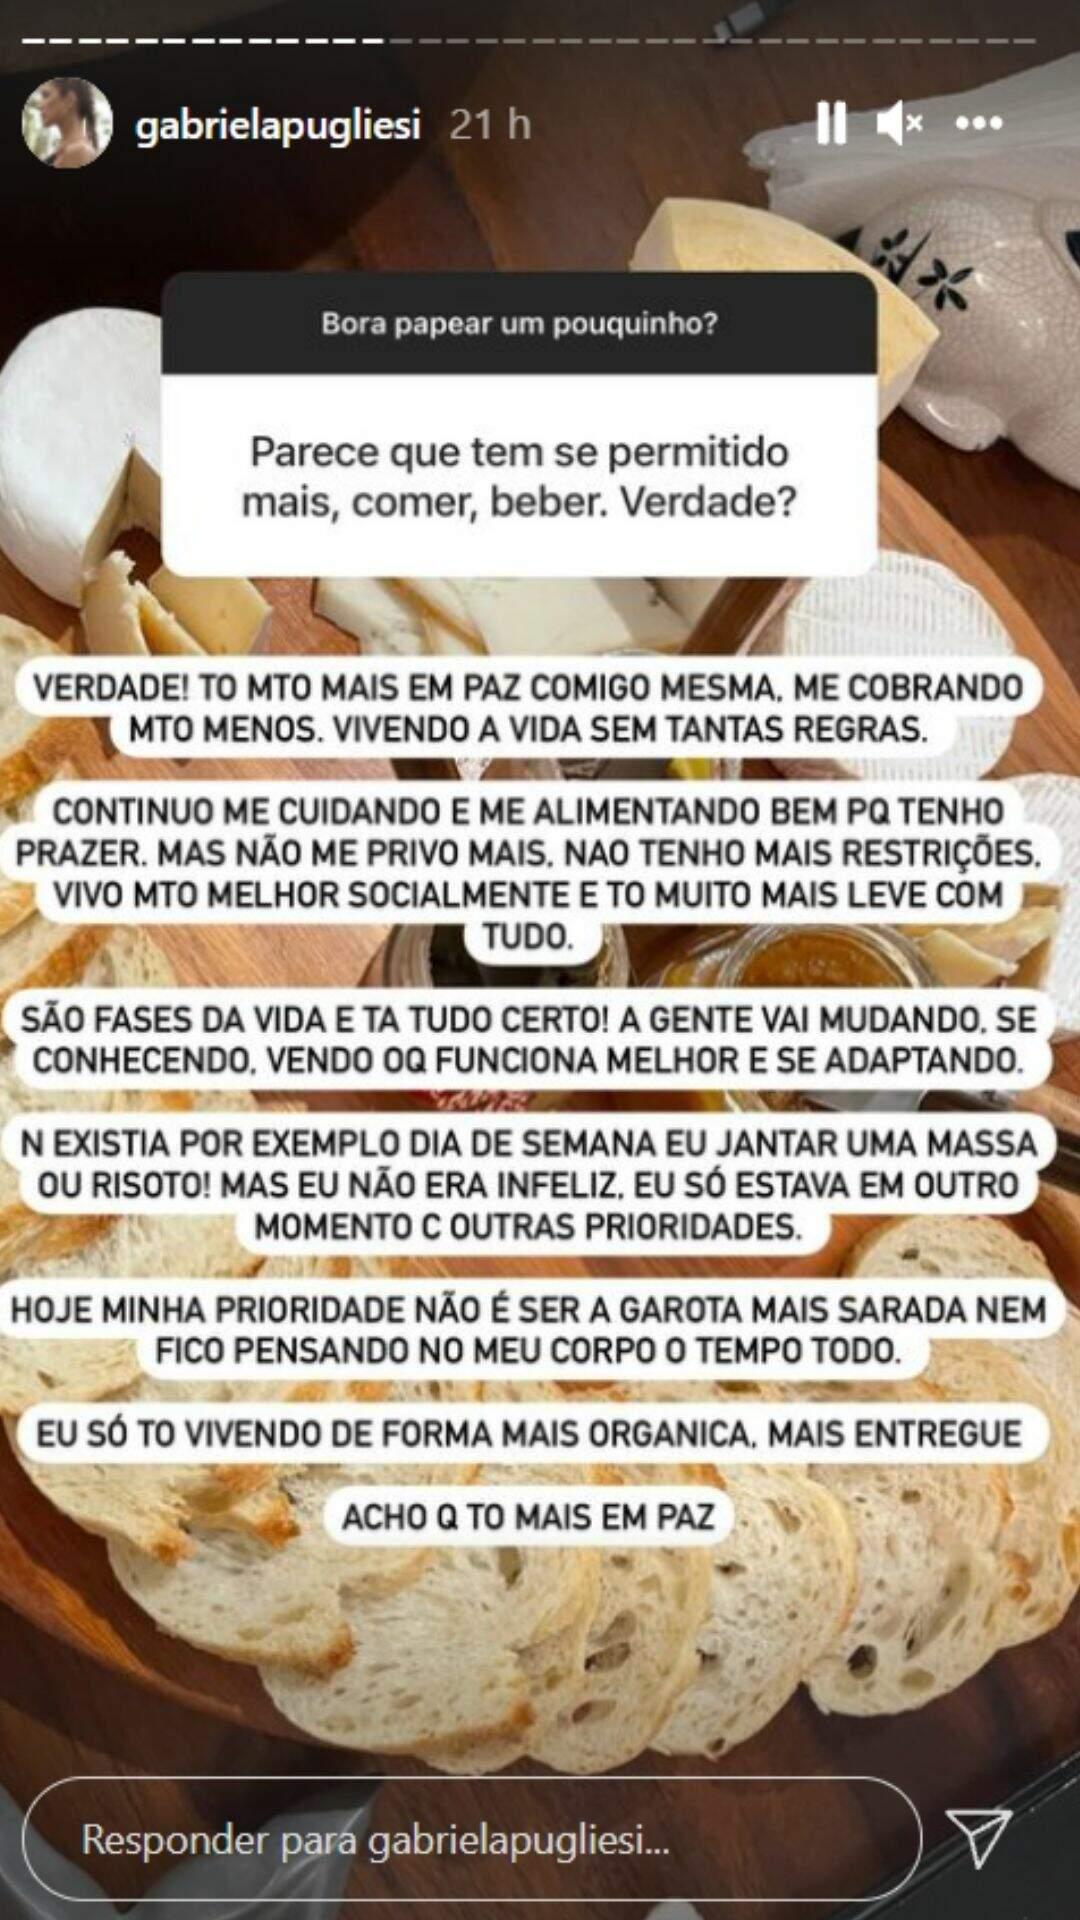 Story Gabriela Pugliesi